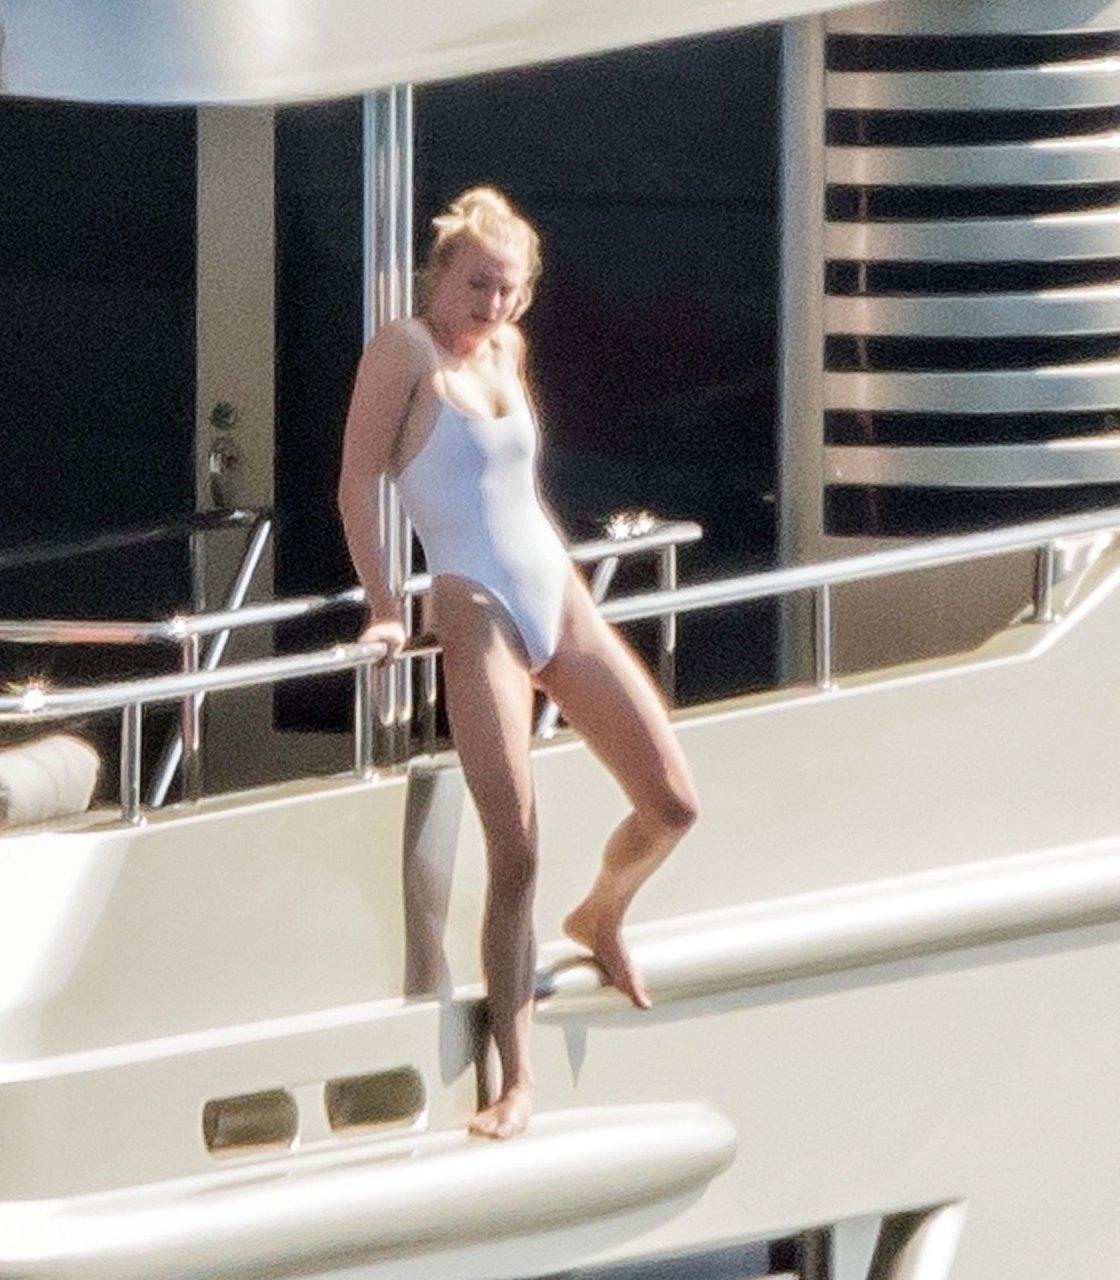 Sophie Turner on their honeymoon holiday in Positano, 14-7-2019